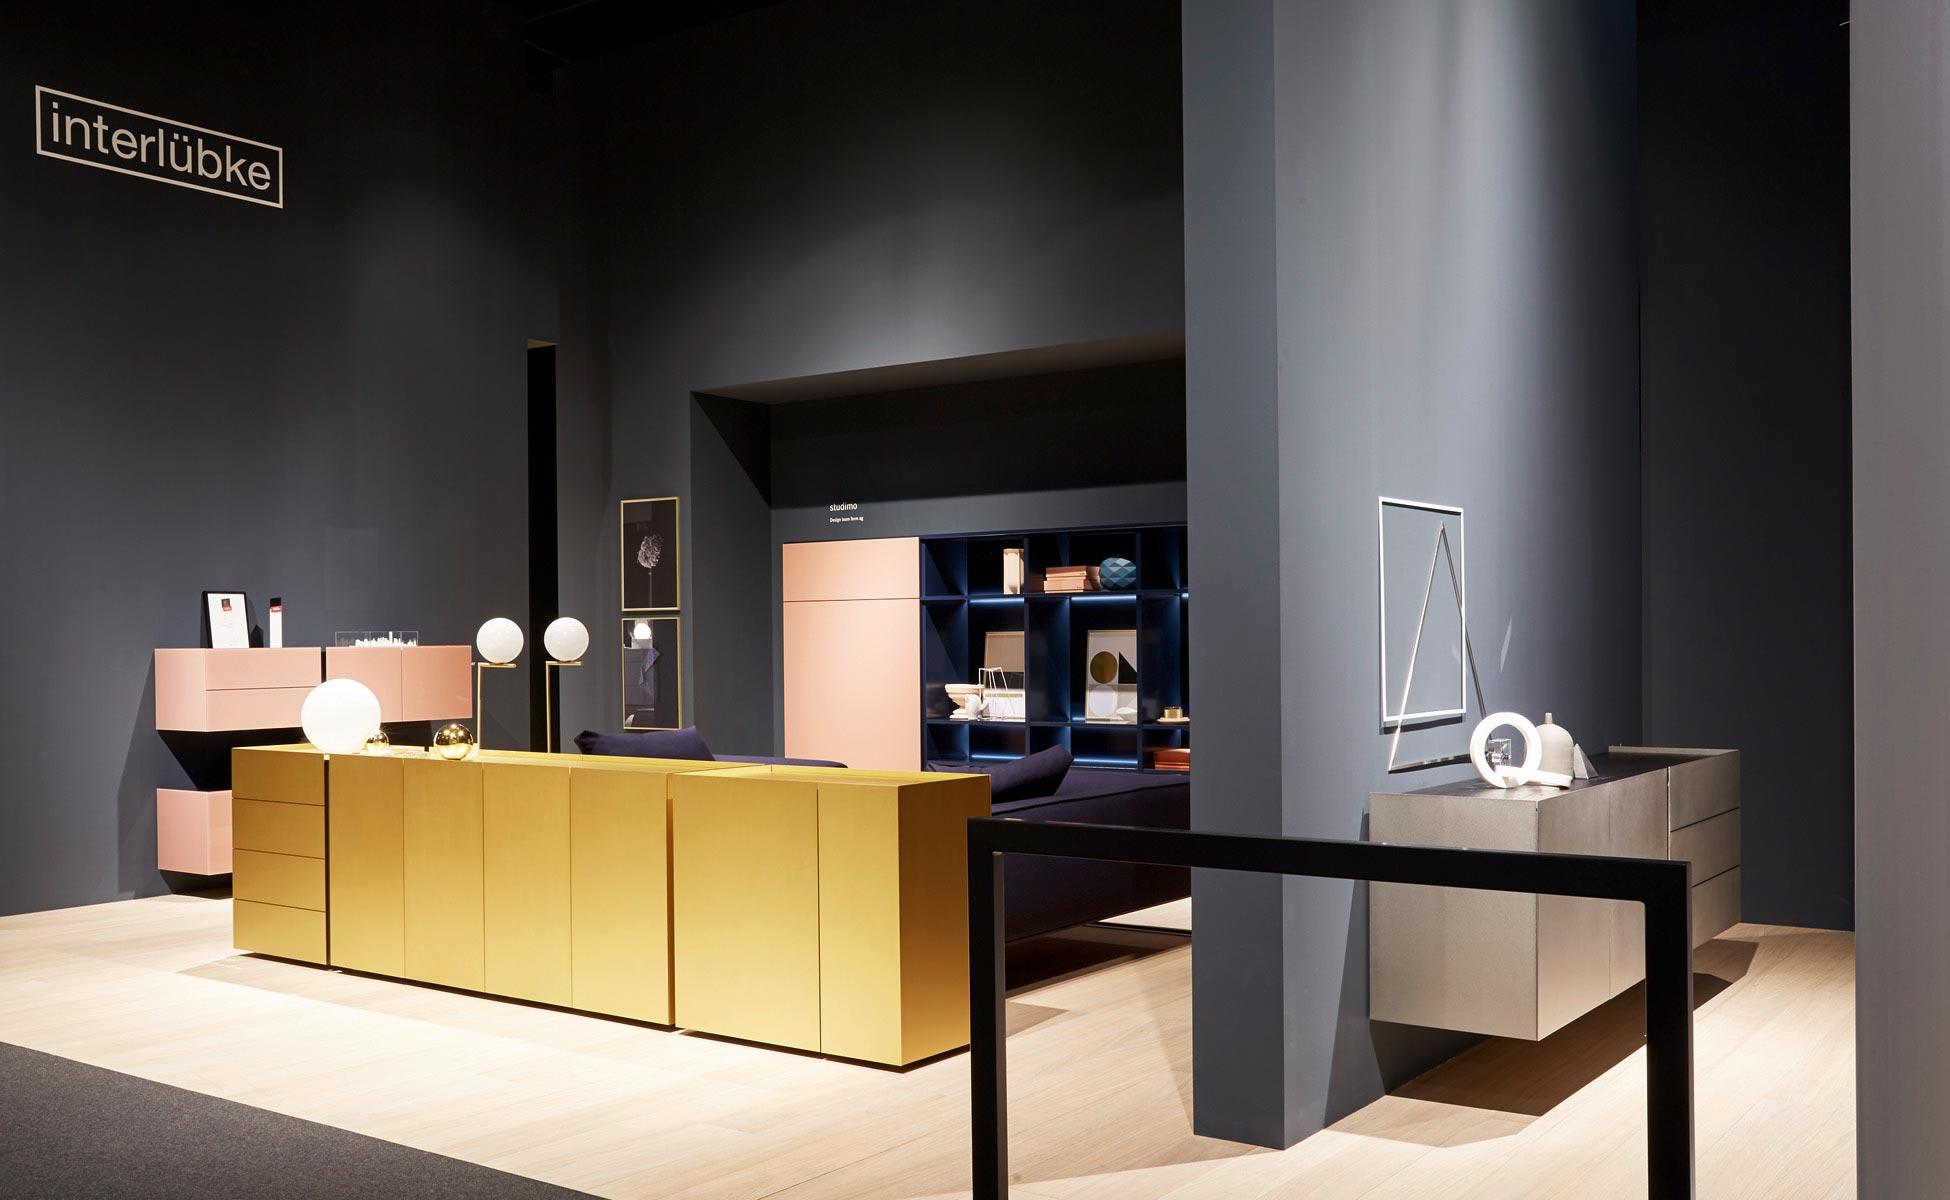 interl bke jorel sideboard berlin steidten einrichten. Black Bedroom Furniture Sets. Home Design Ideas